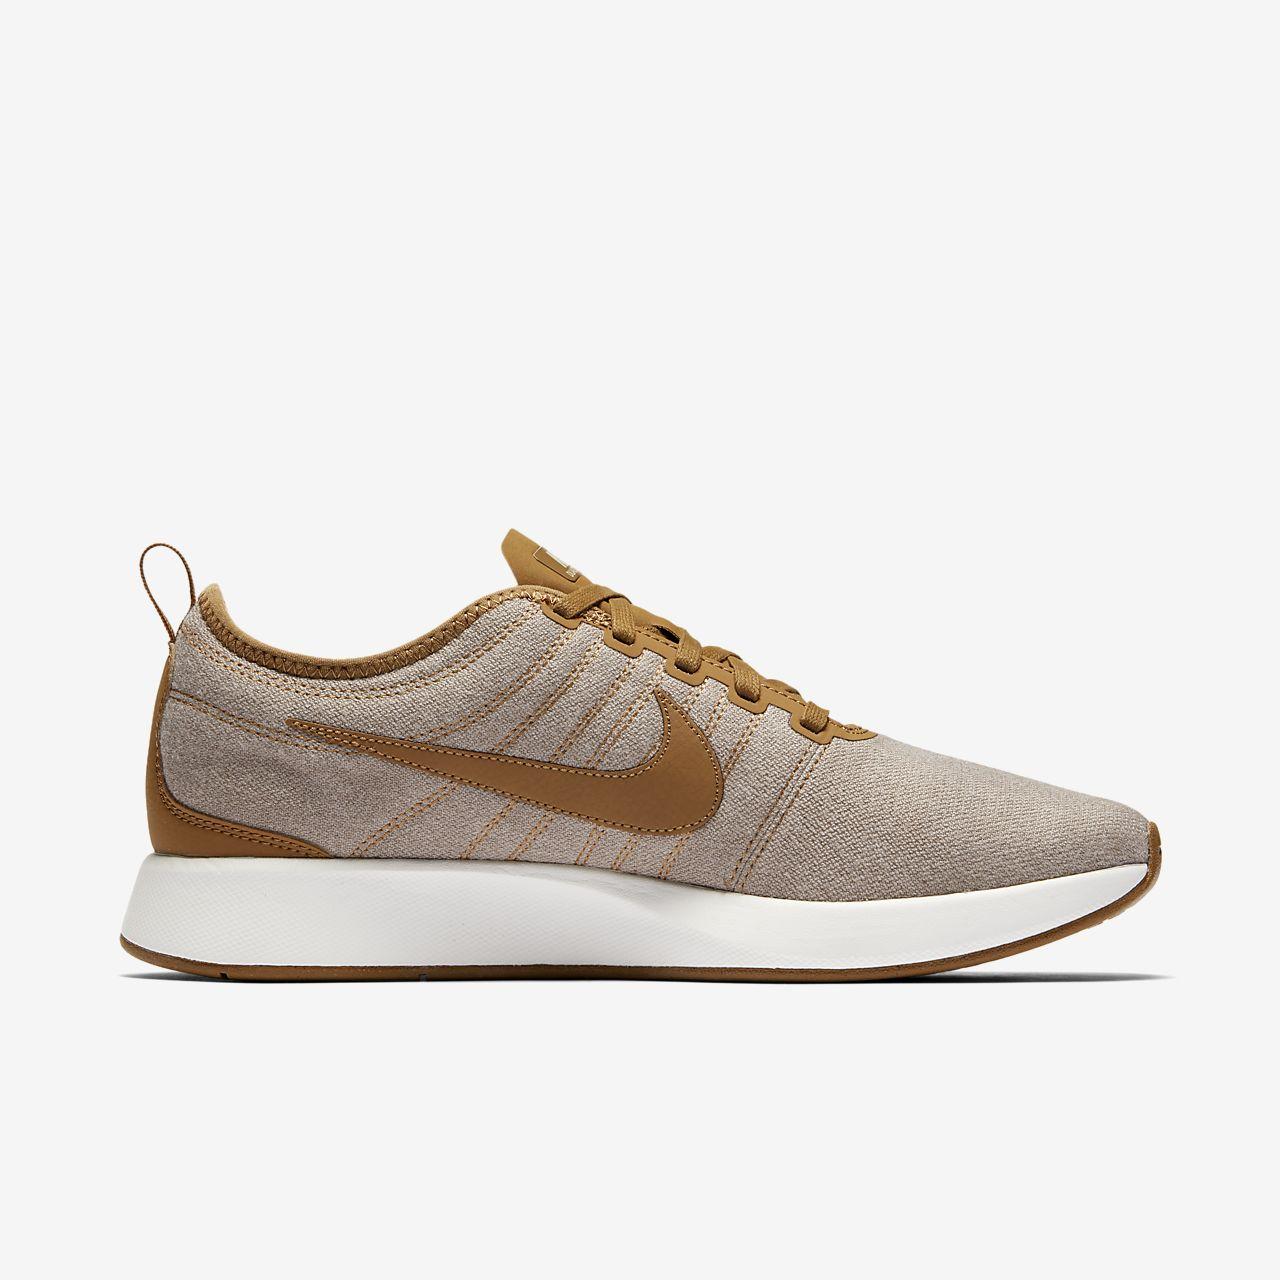 ... Nike Dualtone Racer Premium Men's Shoe